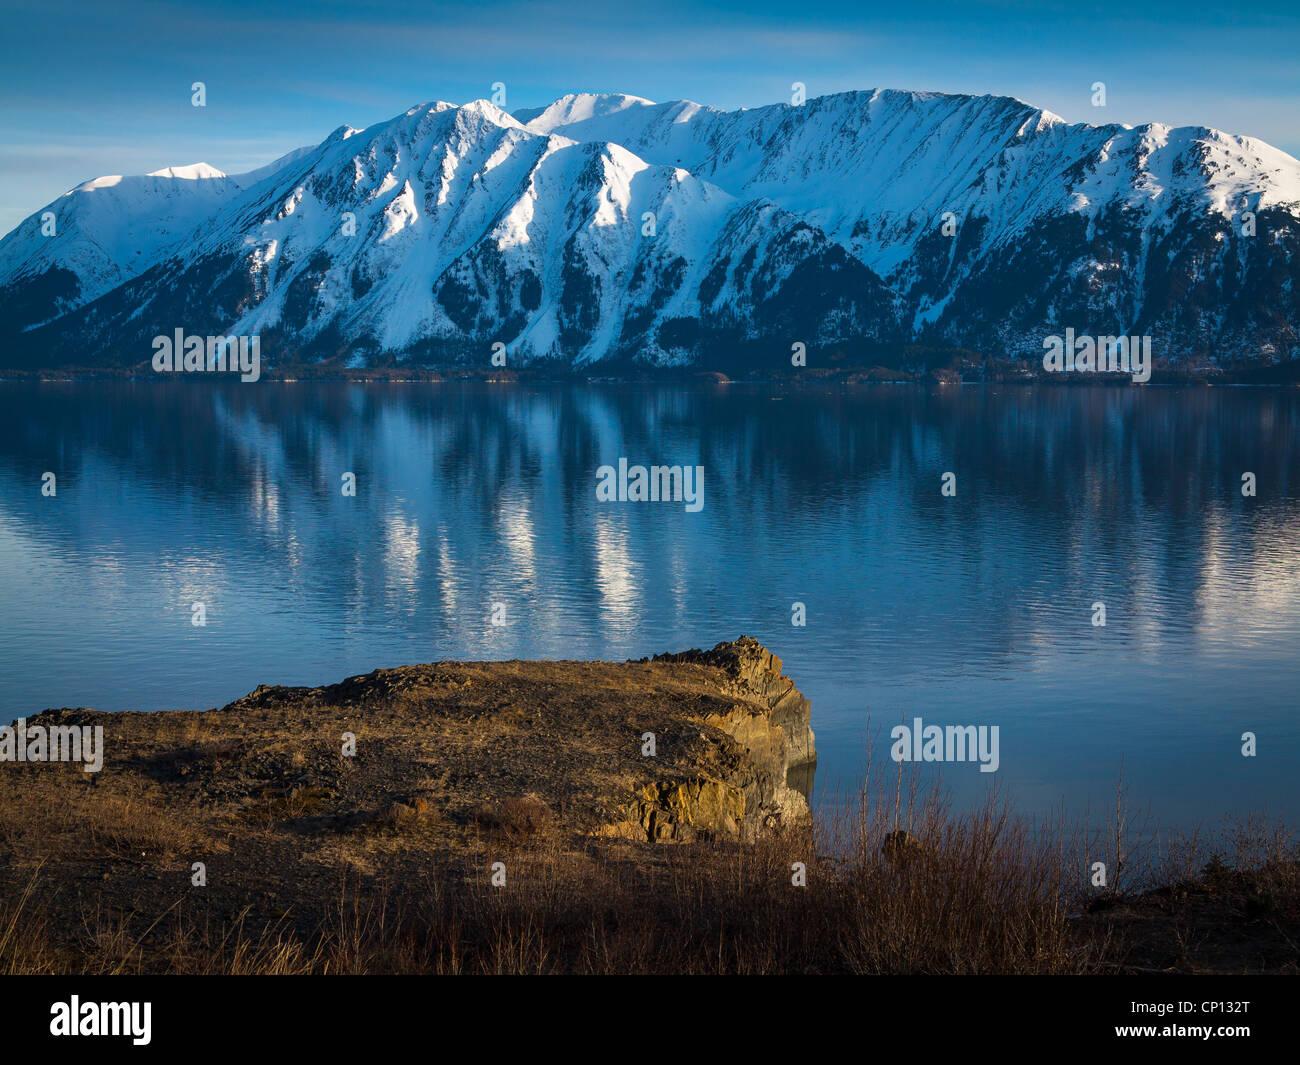 Mountains along the Turnagain Arm near Anchorage, Alaska. - Stock Image